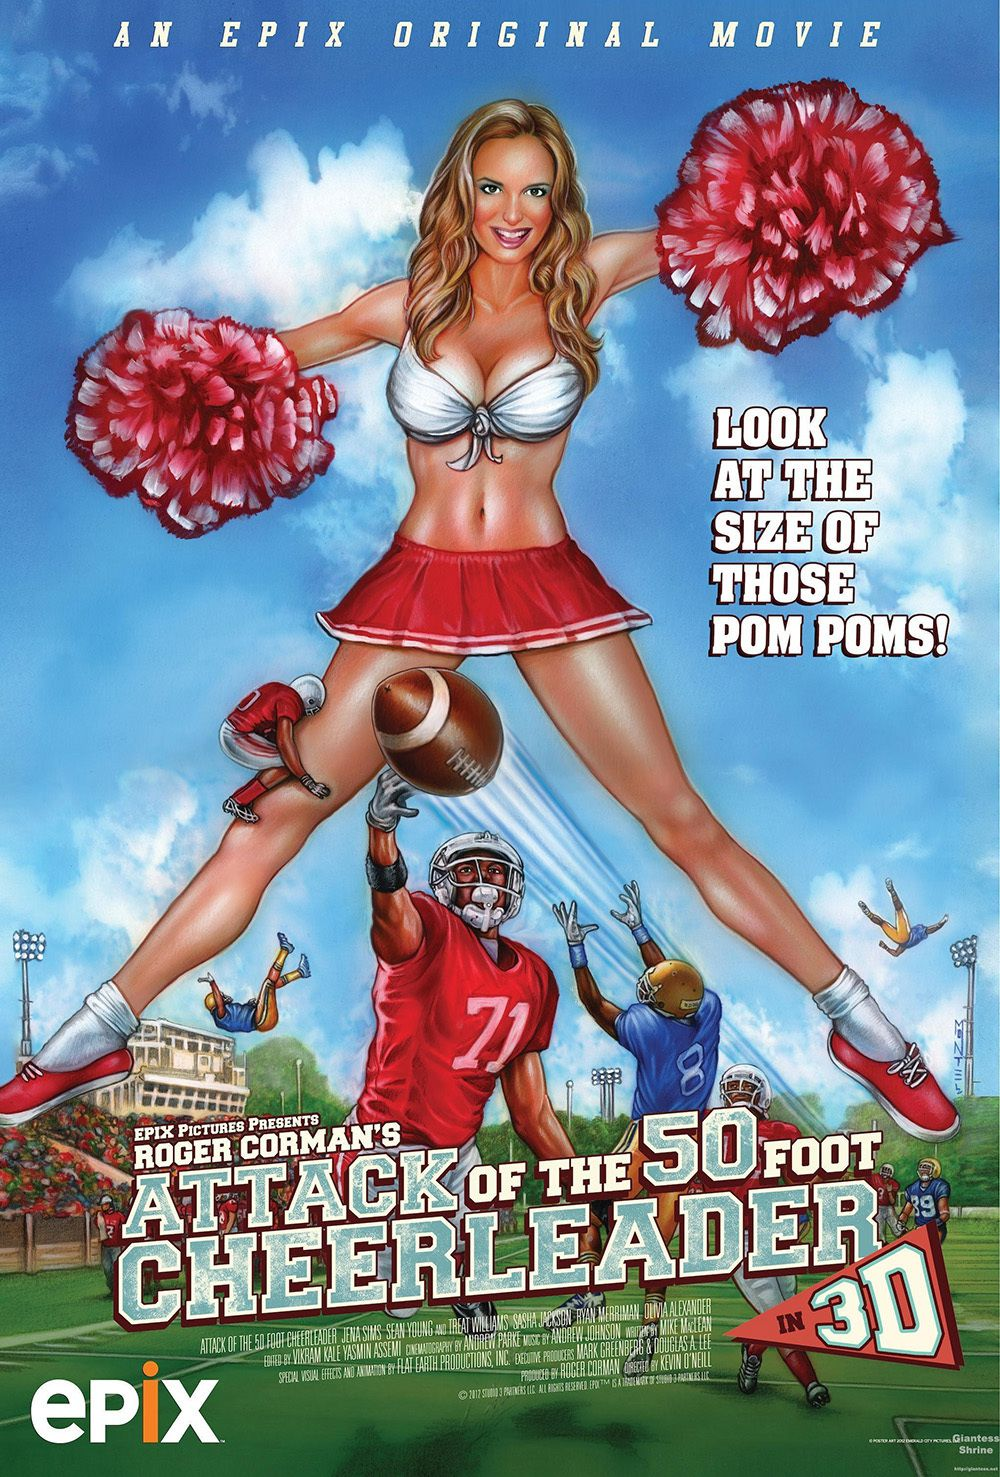 L'attaque de la pom-pom girl géante - Film (2012)